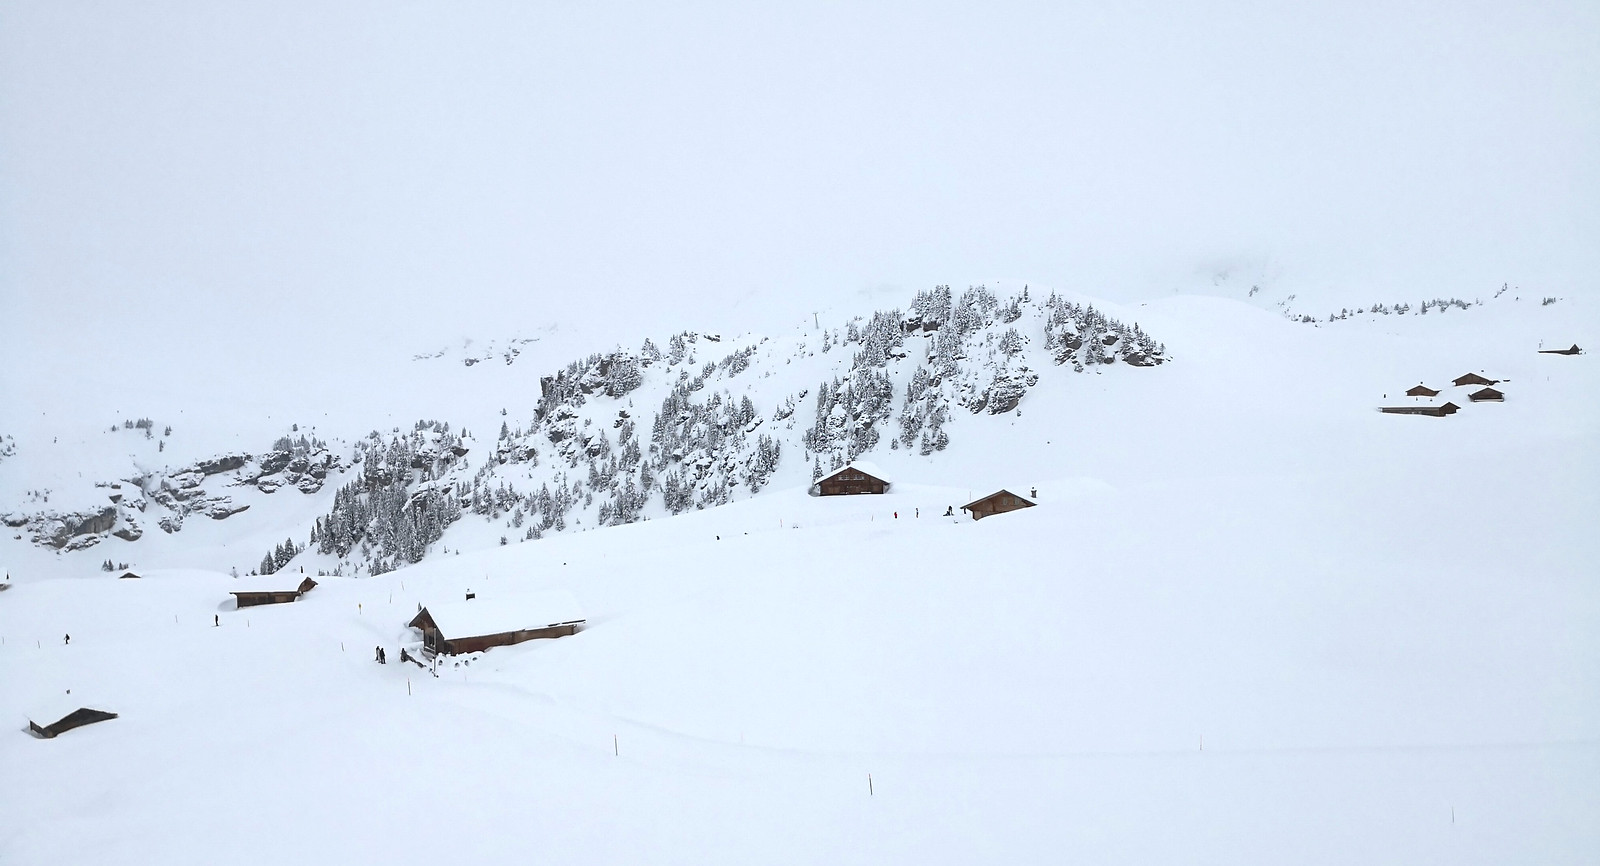 Mountain lodging at Mägisalp